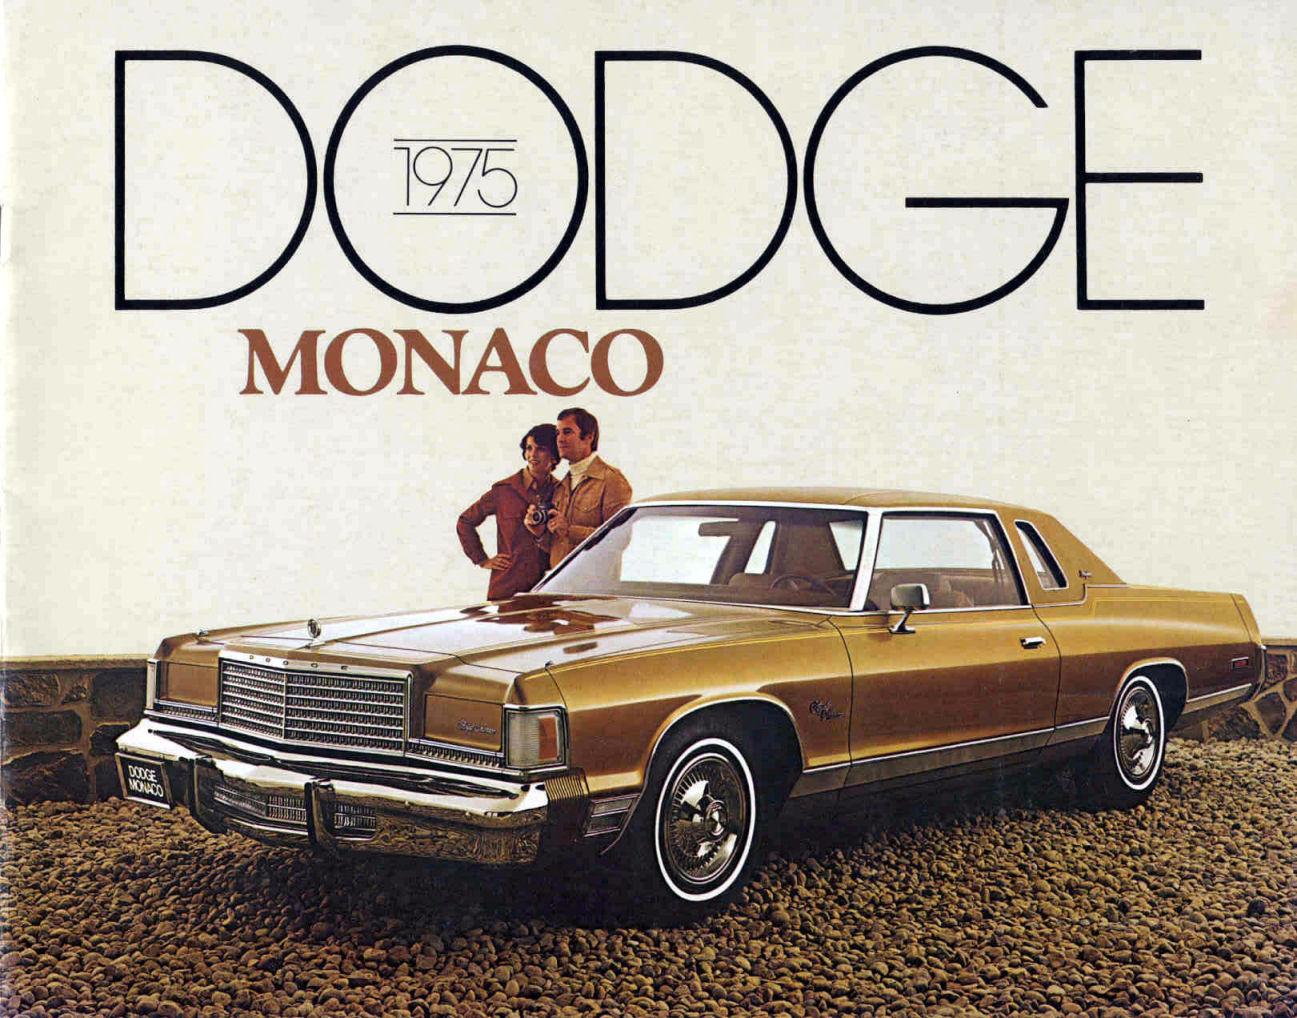 Curbside Classic: 1977 Dodge Royal Monaco Brougham – La Fin